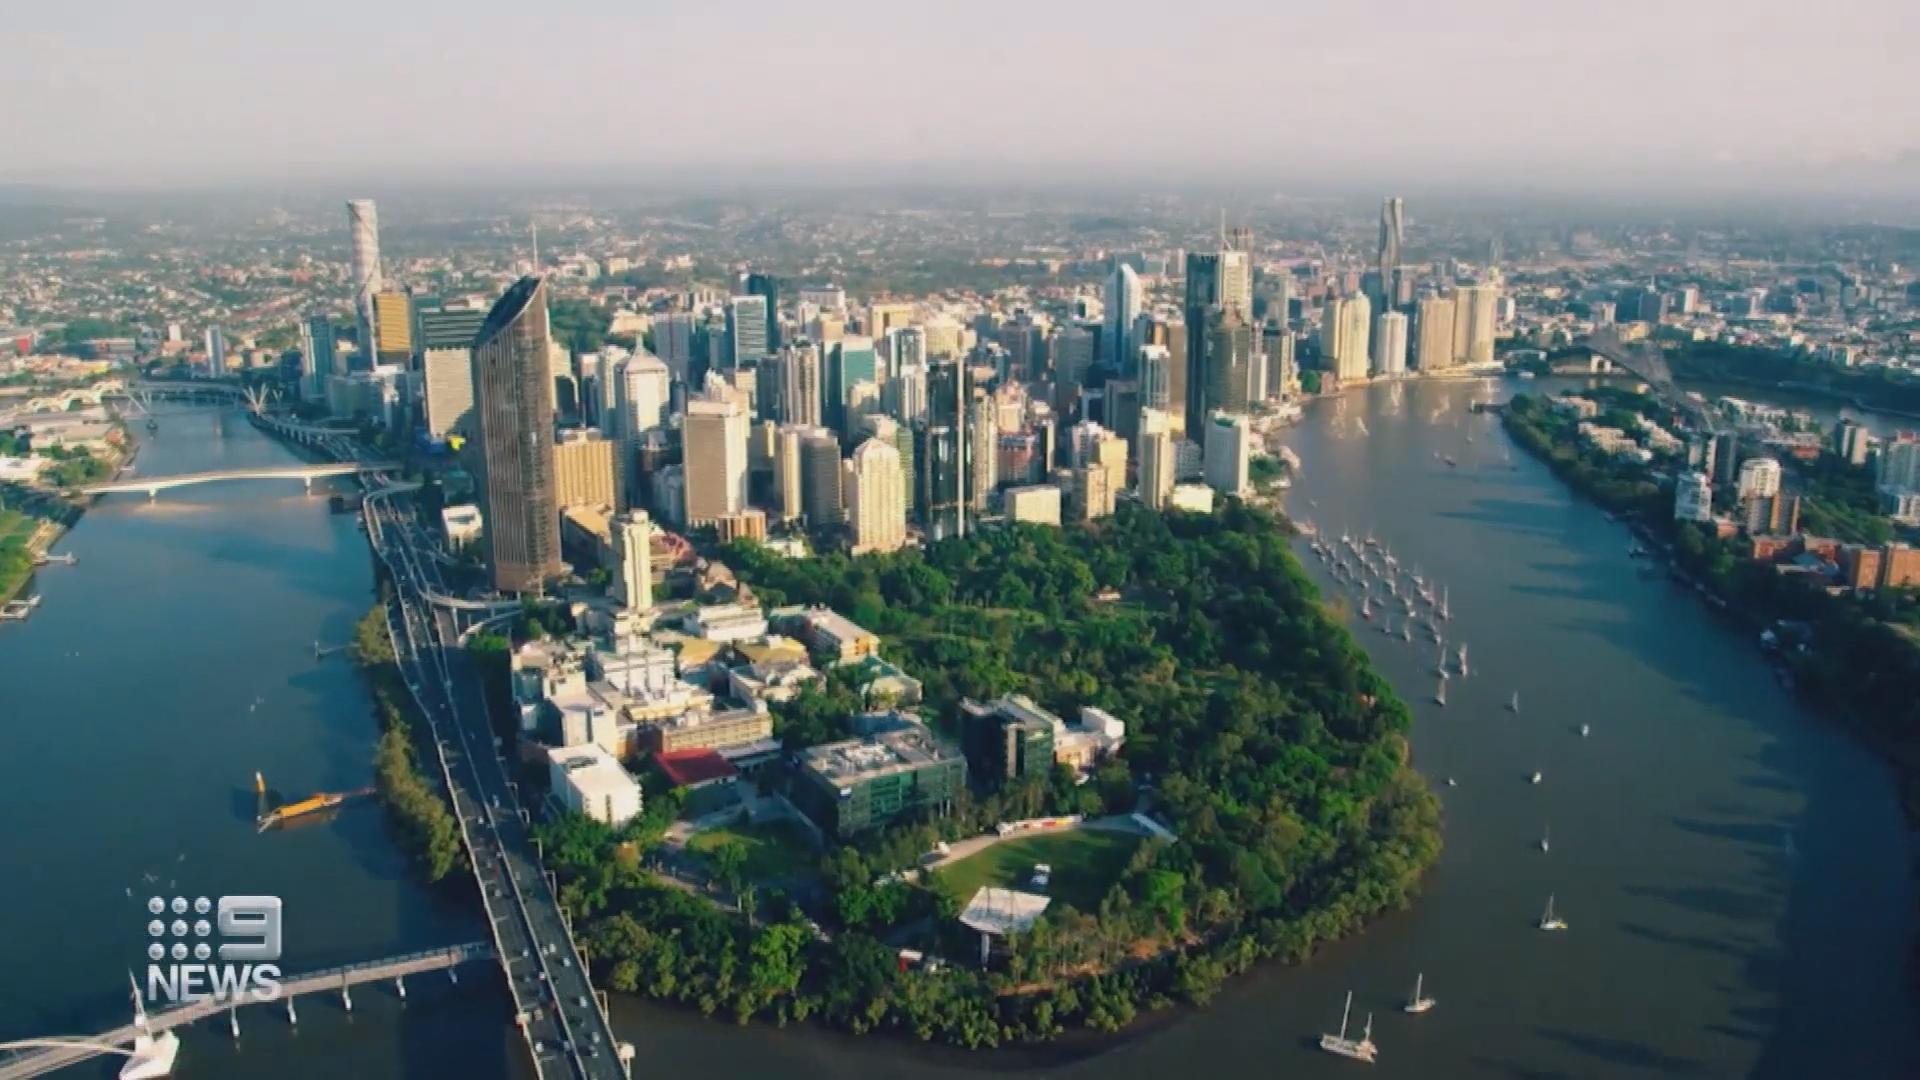 Brisbane to prepare for 2032 Olympics